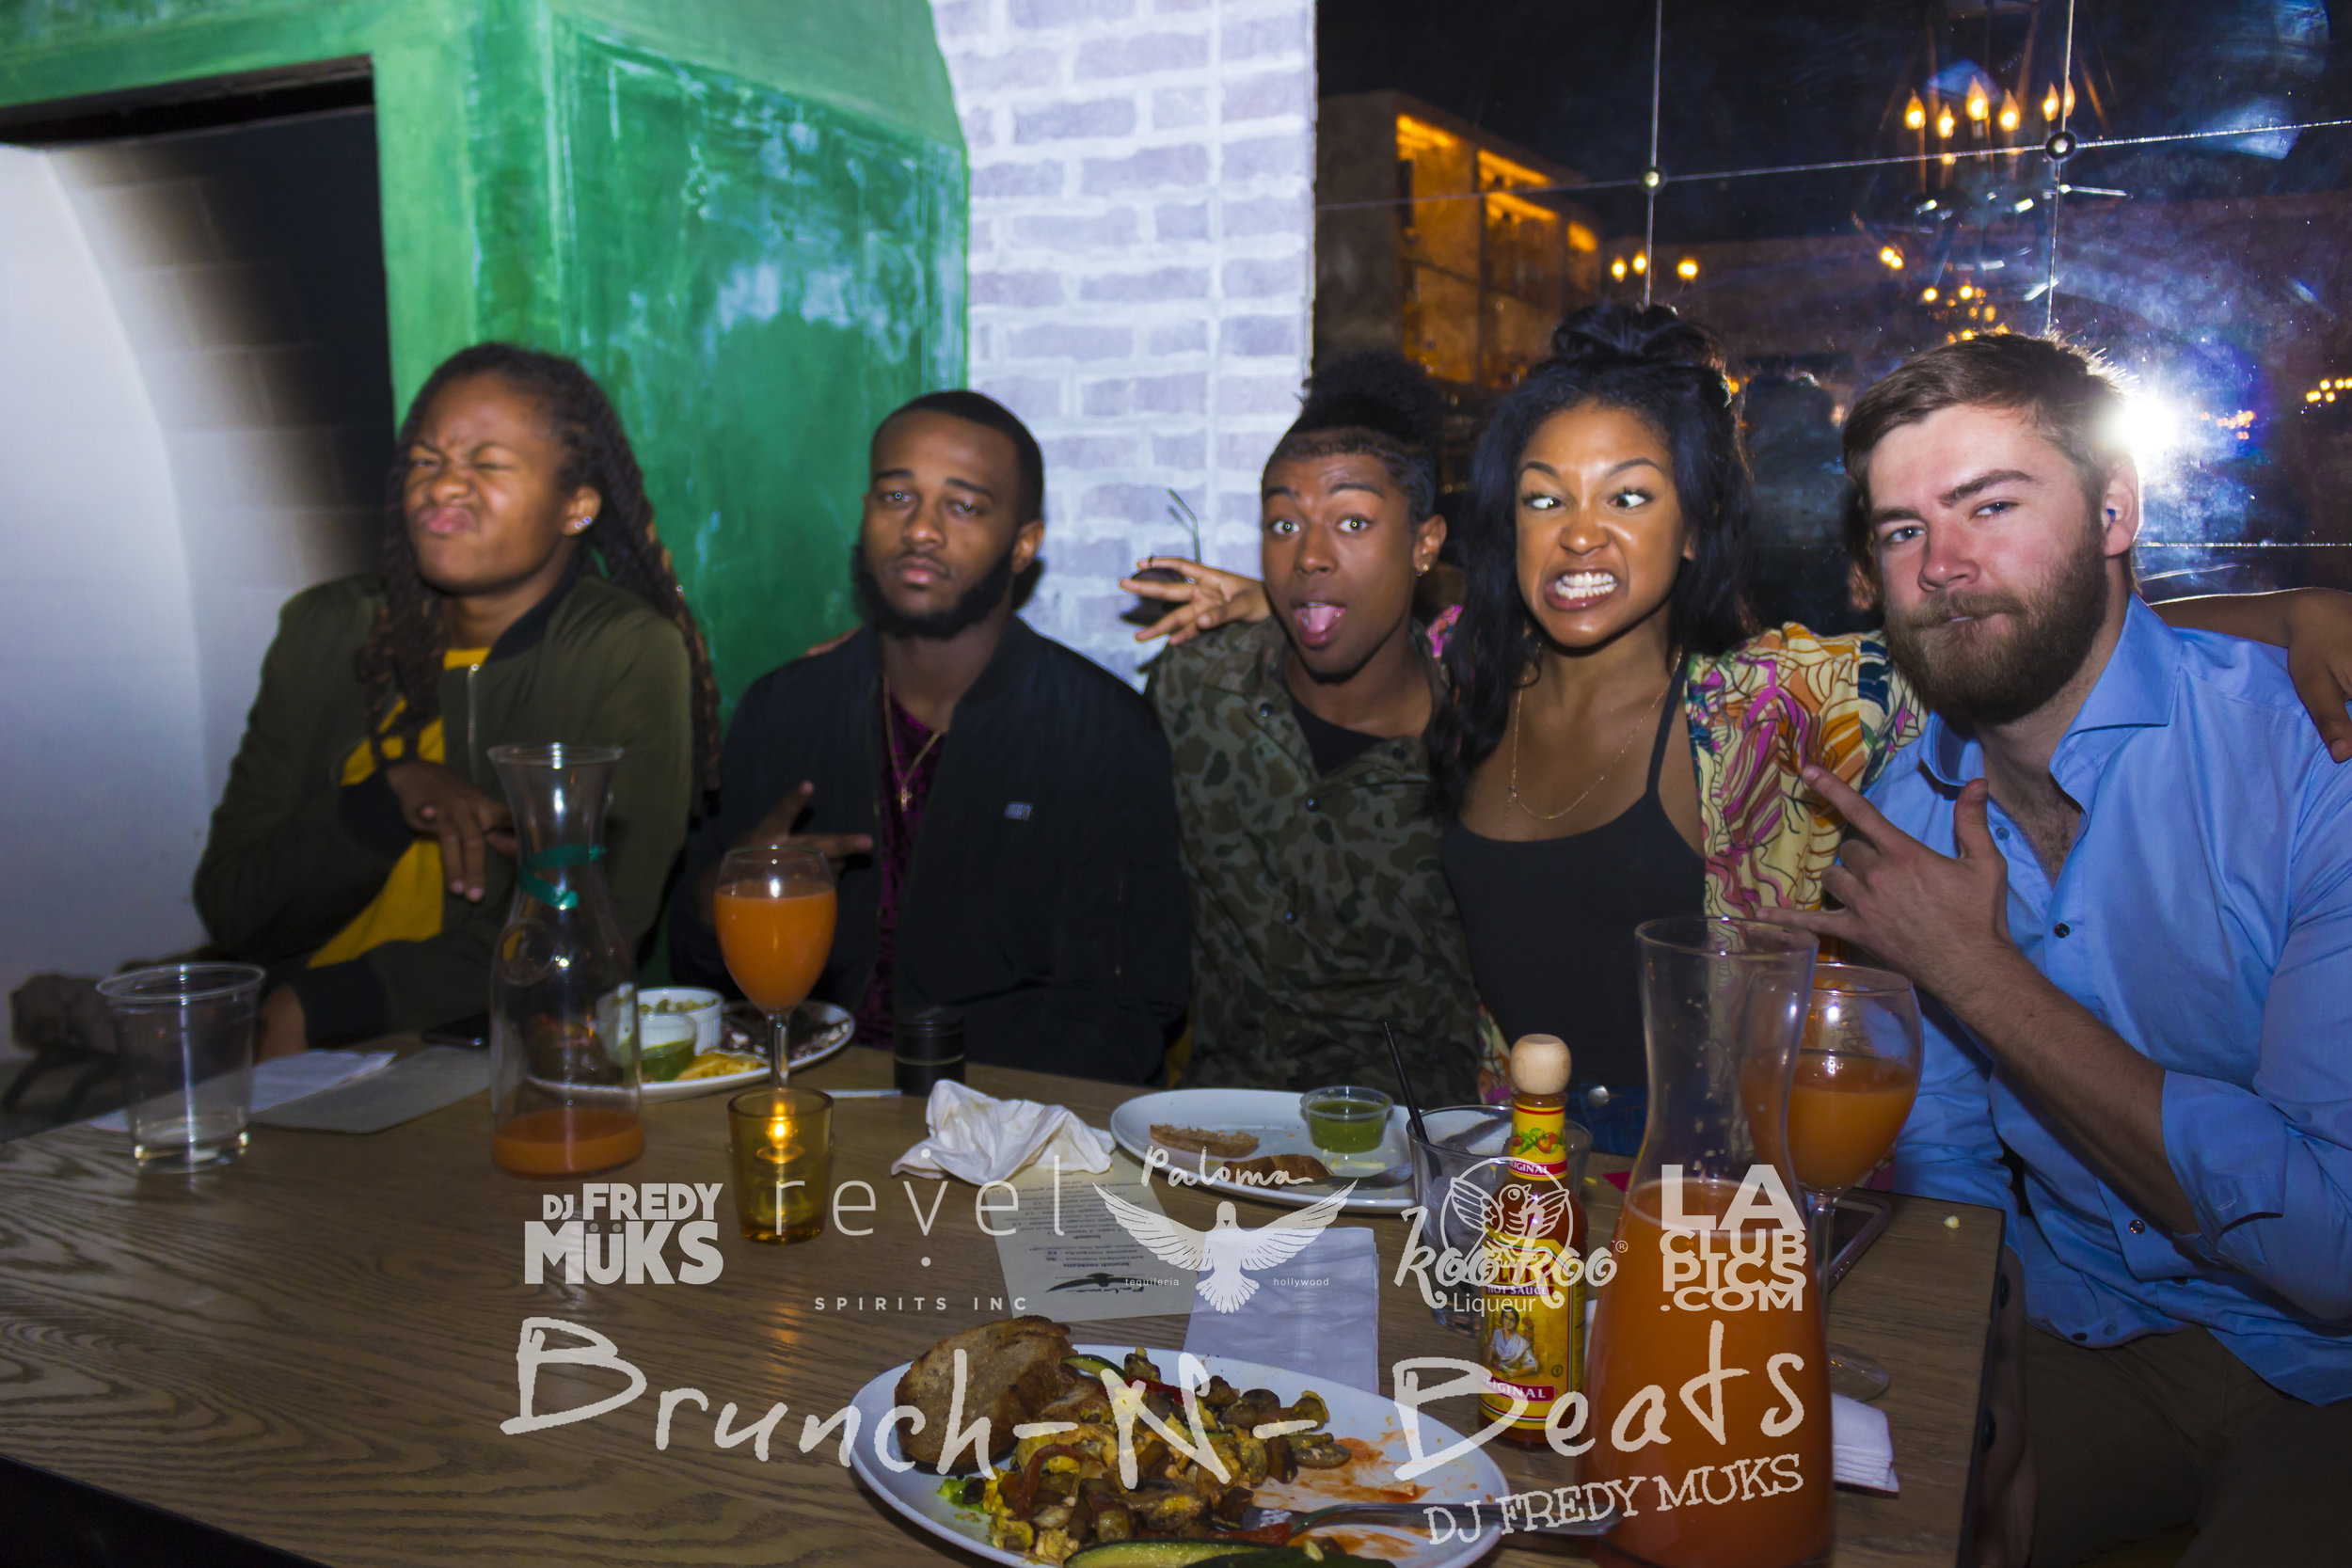 Brunch-N-Beats - Paloma Hollywood - 02-25-18_104.jpg